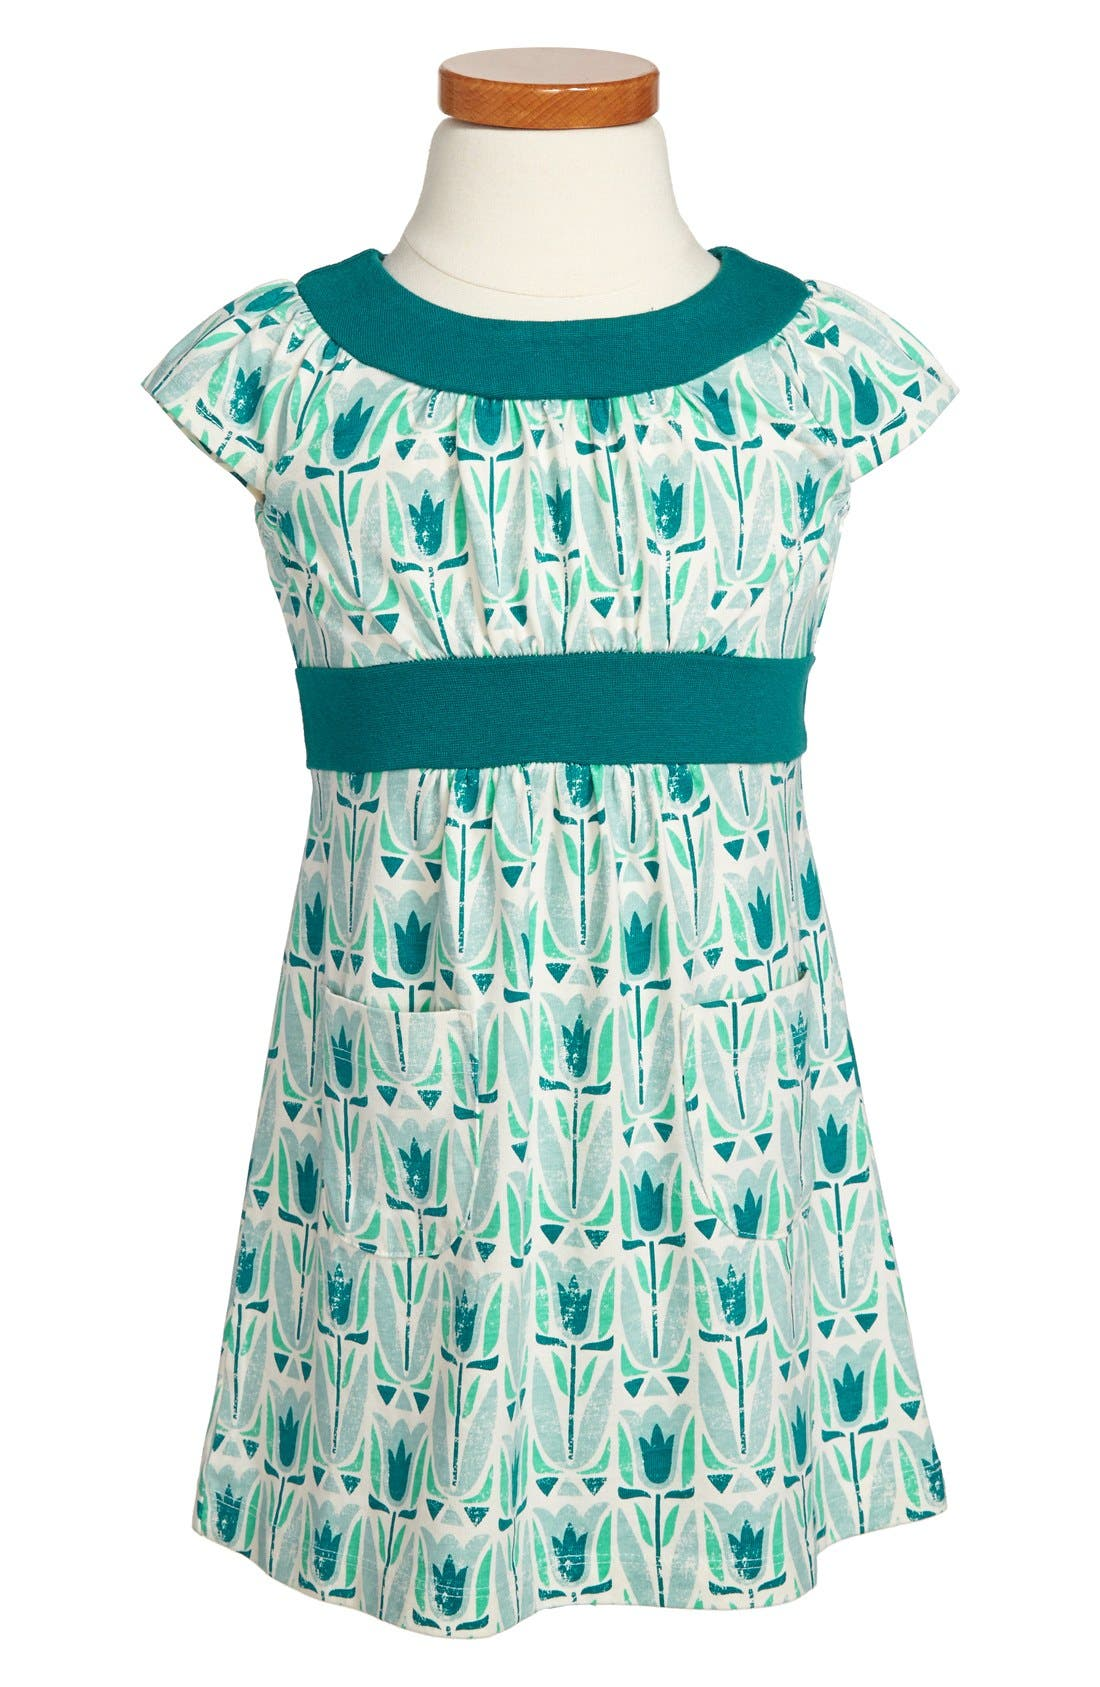 Main Image - Tea Collection 'Mod Tulip' Dress (Toddler Girls, Little Girls & Big Girls)